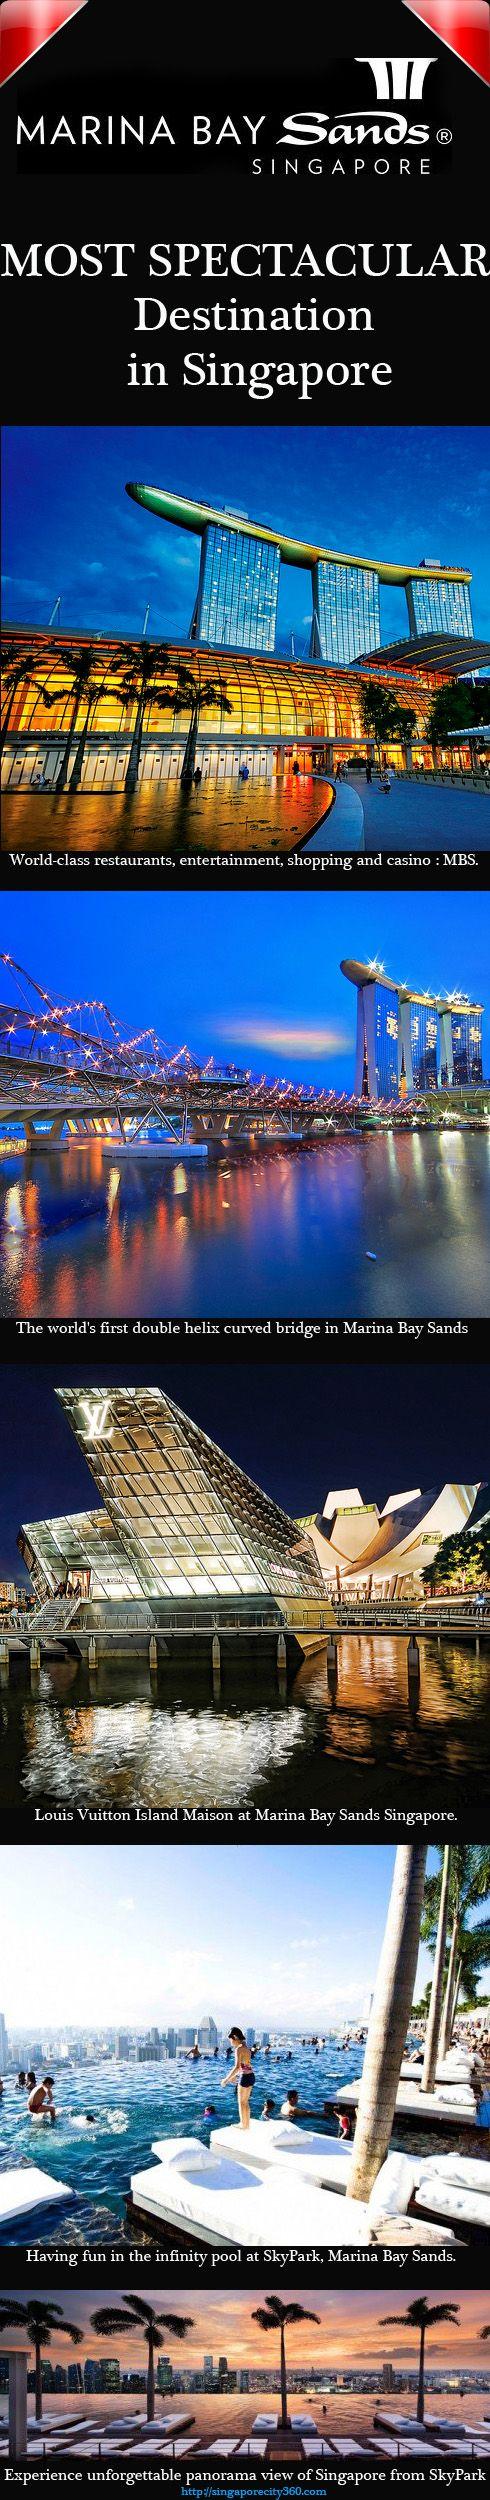 Fantastic World! I love Singapore! >> singapore attractions, Marina Bay Sands, Universal studios singapore, singapore hotels, singapore travel, singapore guide --> http://singaporecity360.com